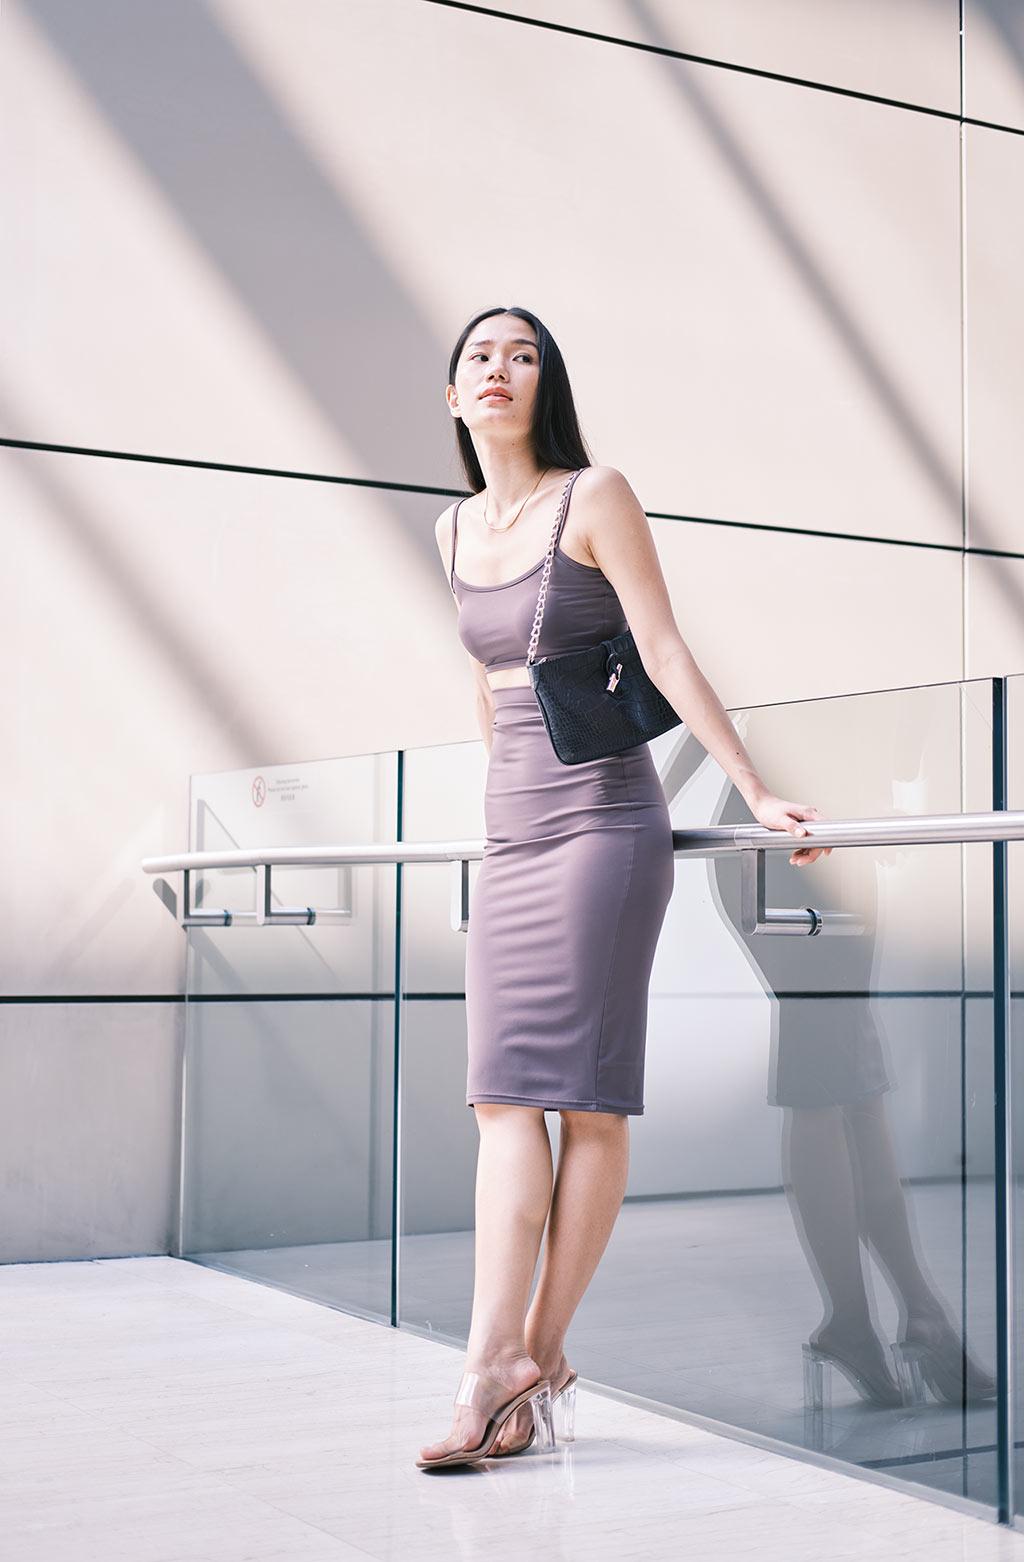 Urban Chic Street Fashion Custom Film Recipe for Fujifilm